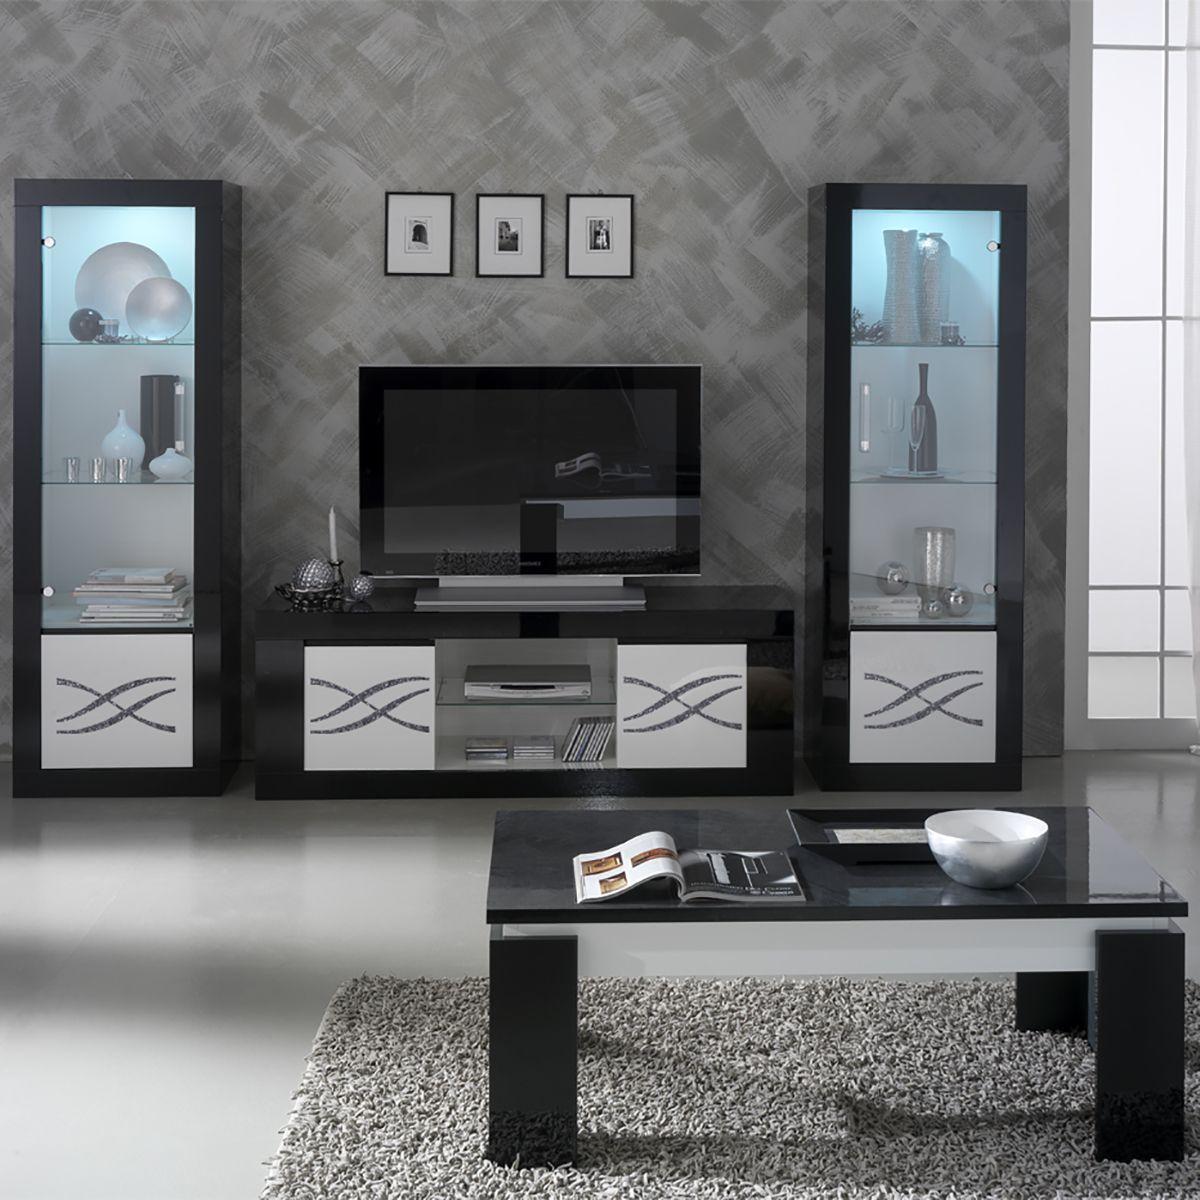 Altobuy-Victoria-Luxury-Ensemble-Salon-Complet-Neuf